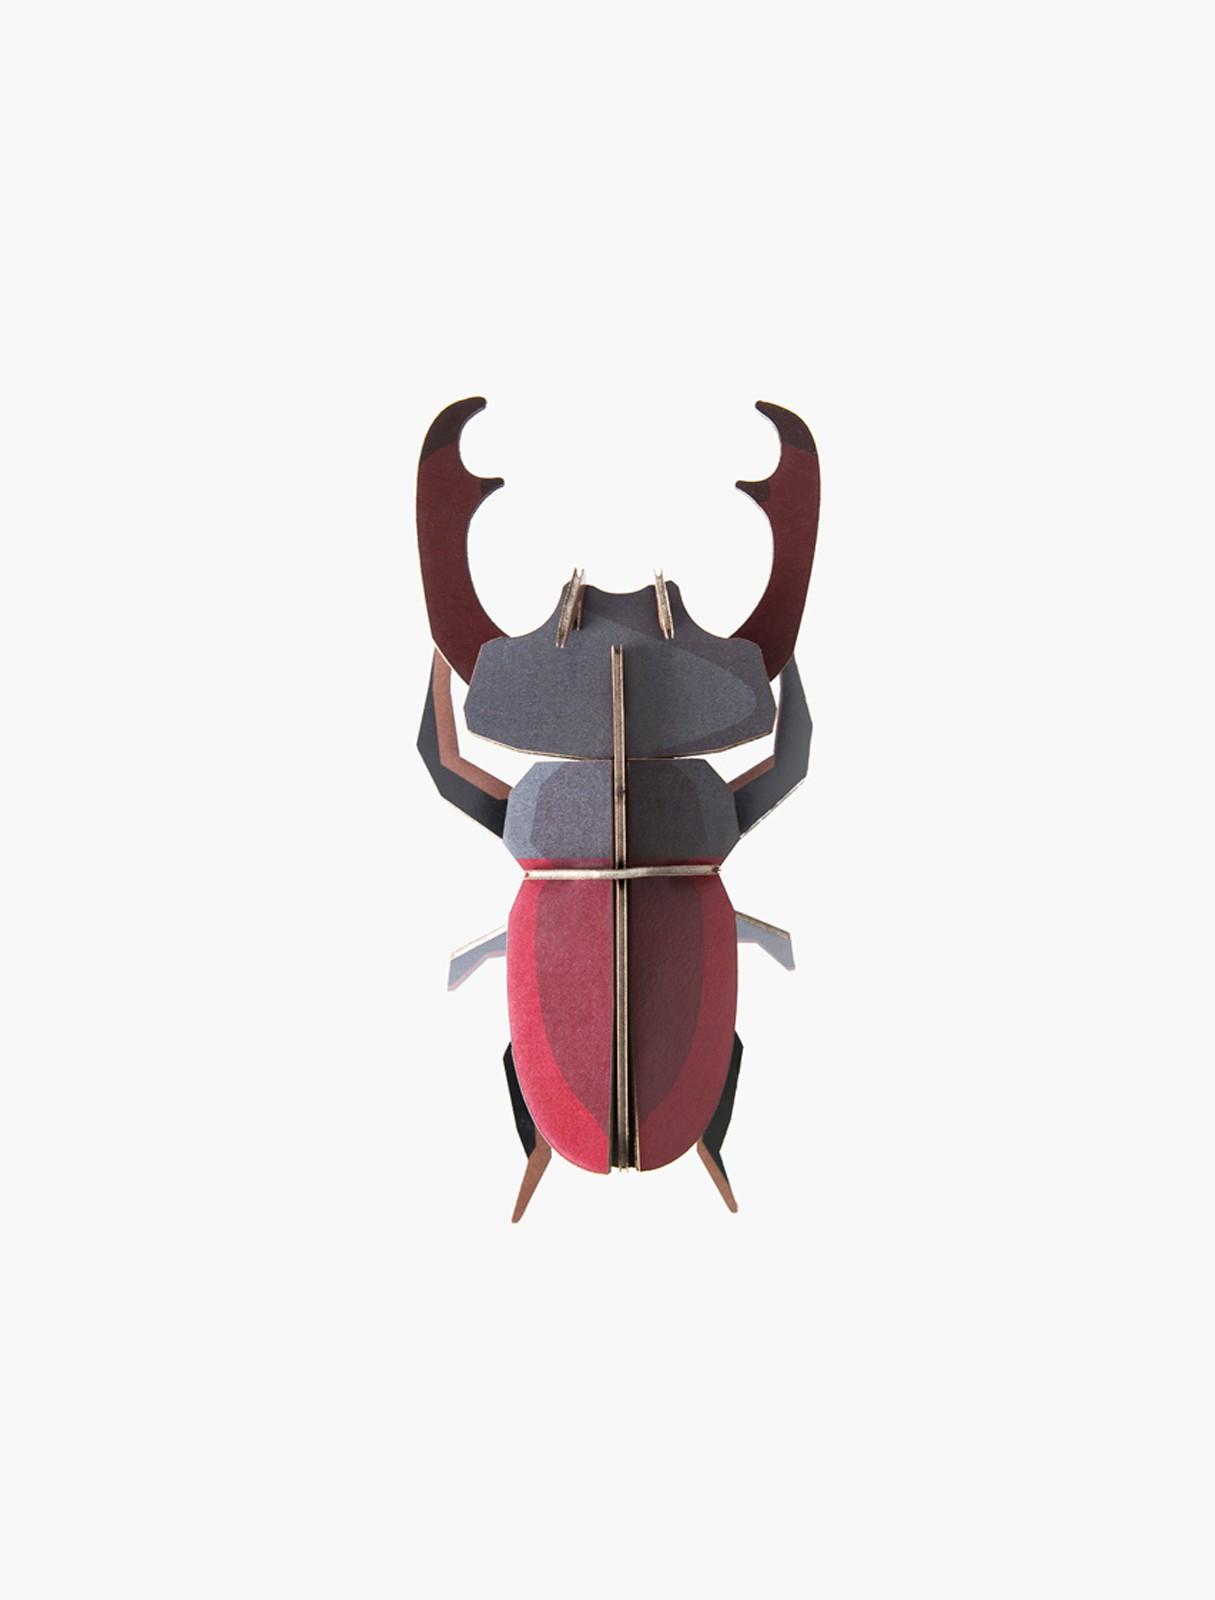 Décoration Stag Beetle - studio ROOF